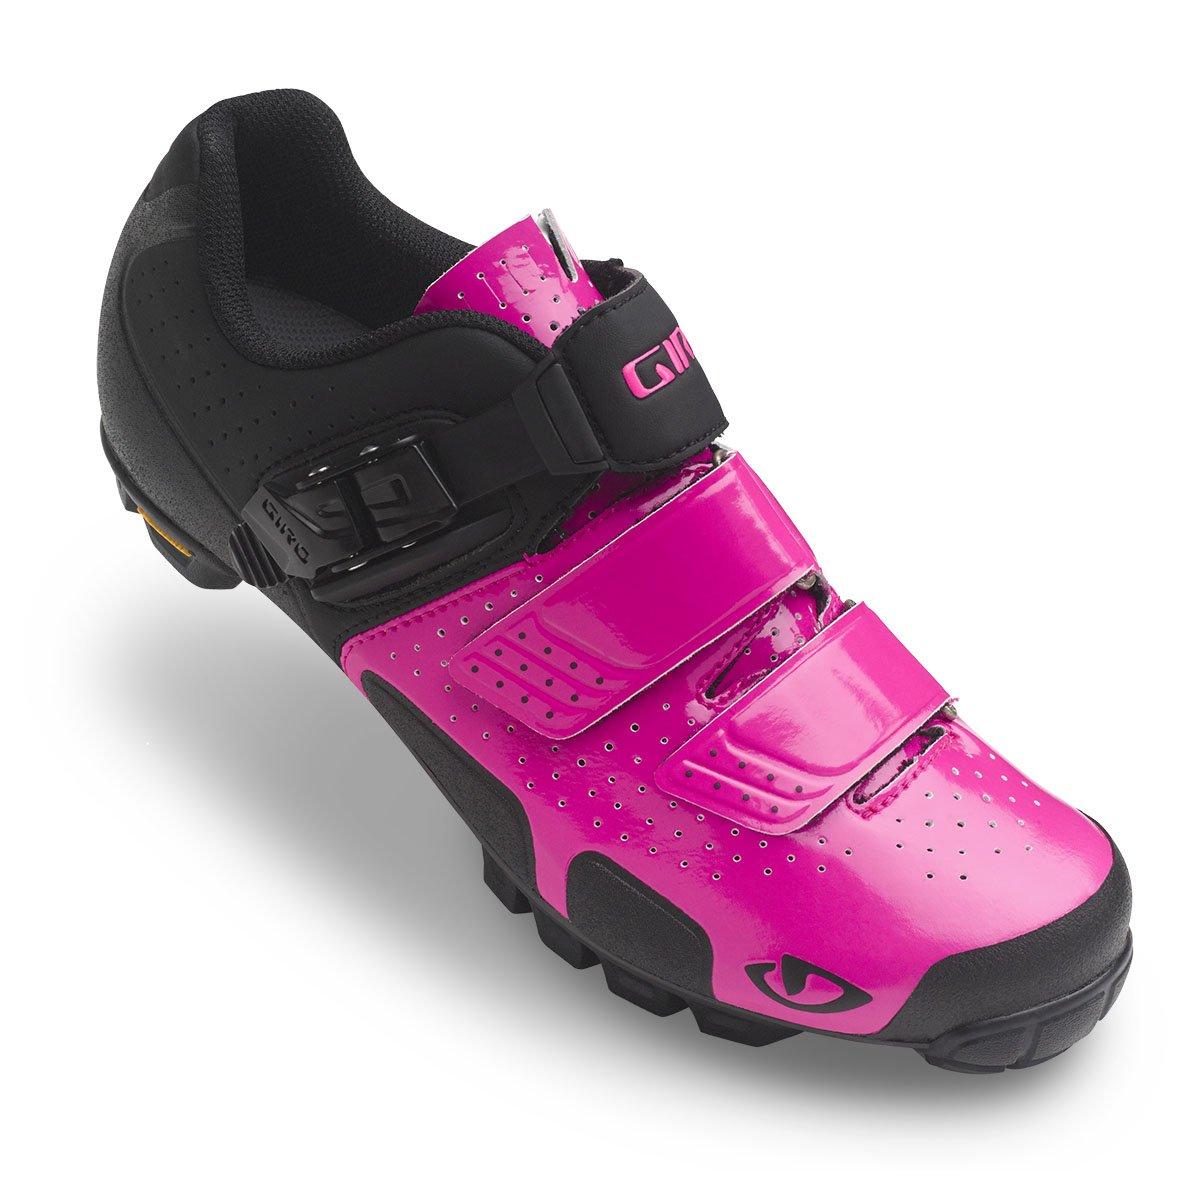 Giro GF23110 Womens Sica Vr70 Dirt Bike Shoes B01M2VKIV2 40 M EU Bright Pink/Black